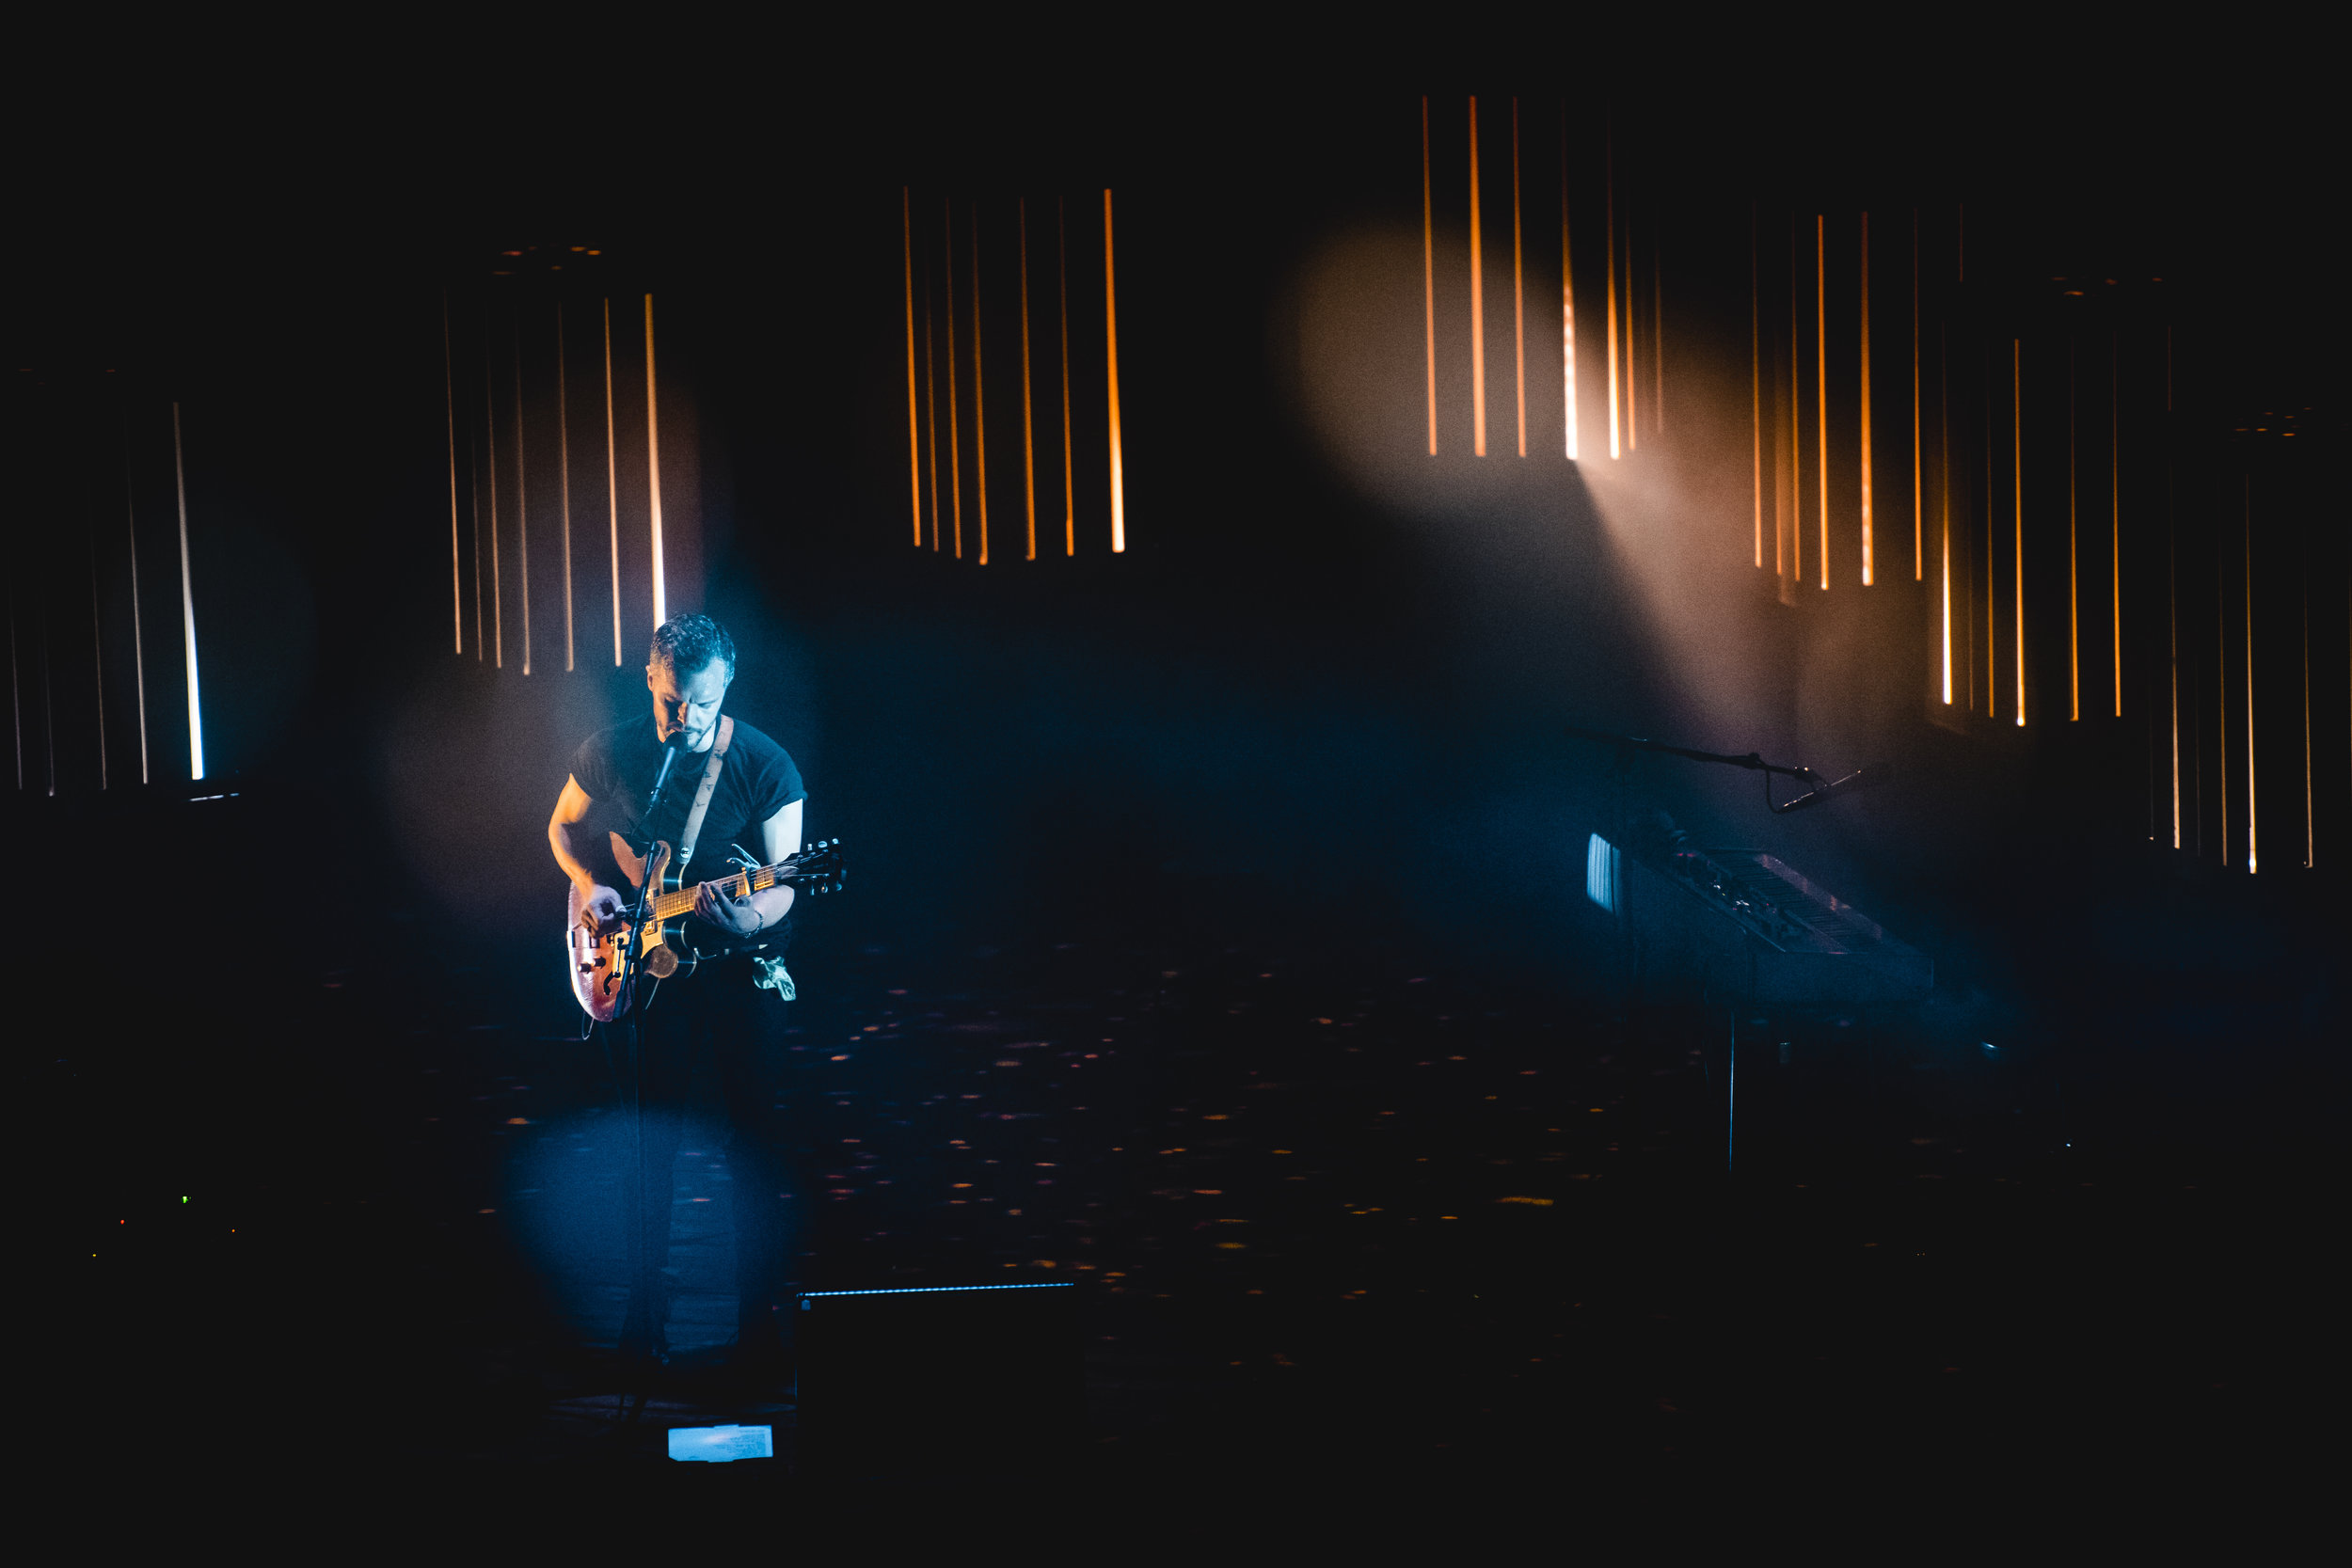 2018-09-27 - De Roma - The Tallest Man on Earth - 02 concert - 016.jpg